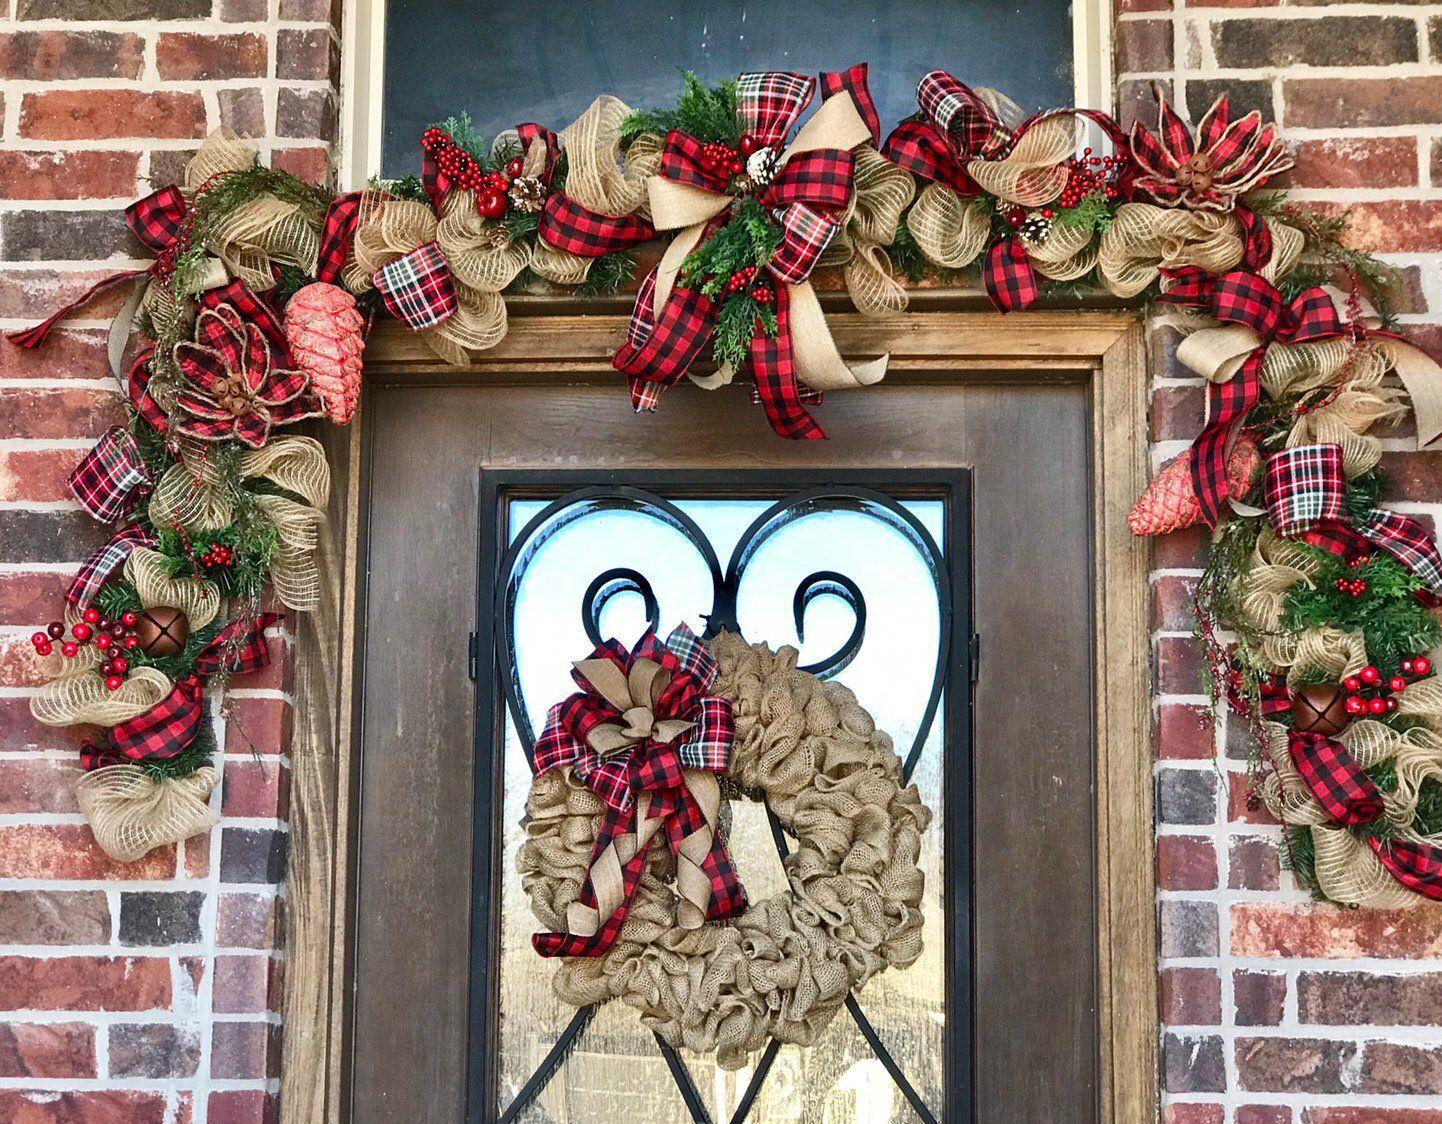 Buffalo Plaid Garland Rustic Farmhouse For Front Door Garland Etsy Winter Garland Christmas Garland Plaid Christmas Decor